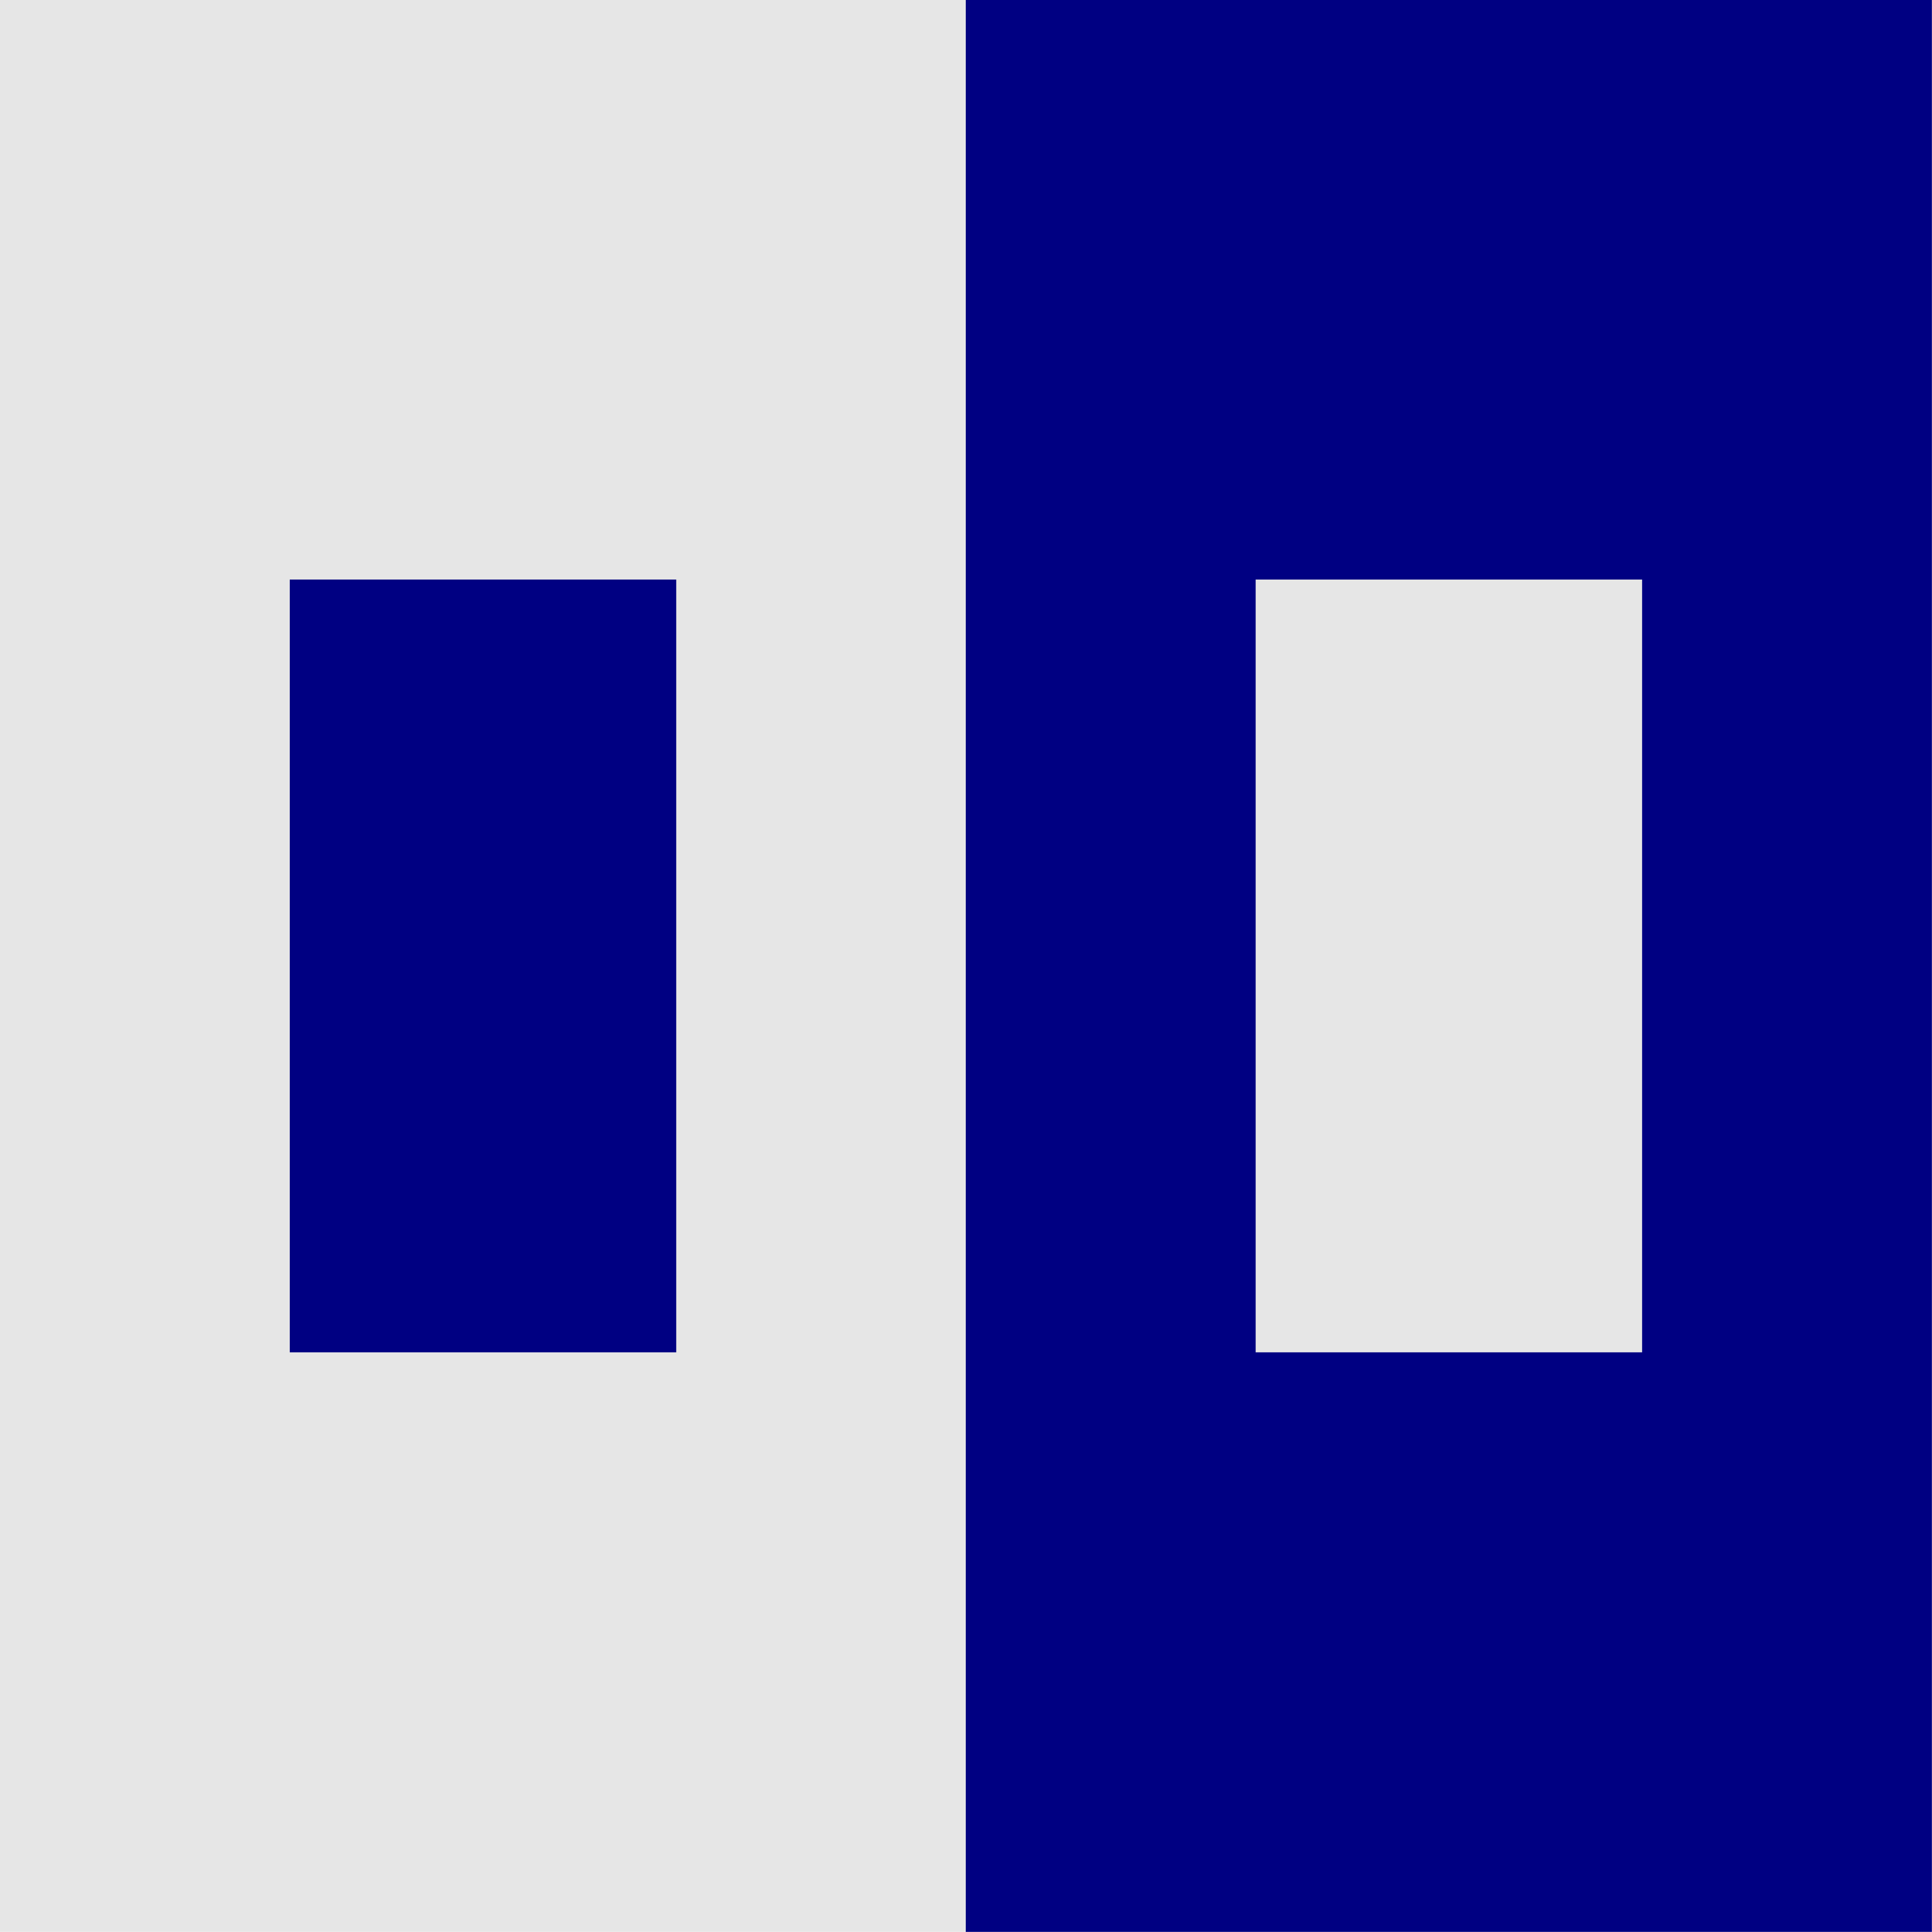 static/images/examples/Grau_Blau_ai.png